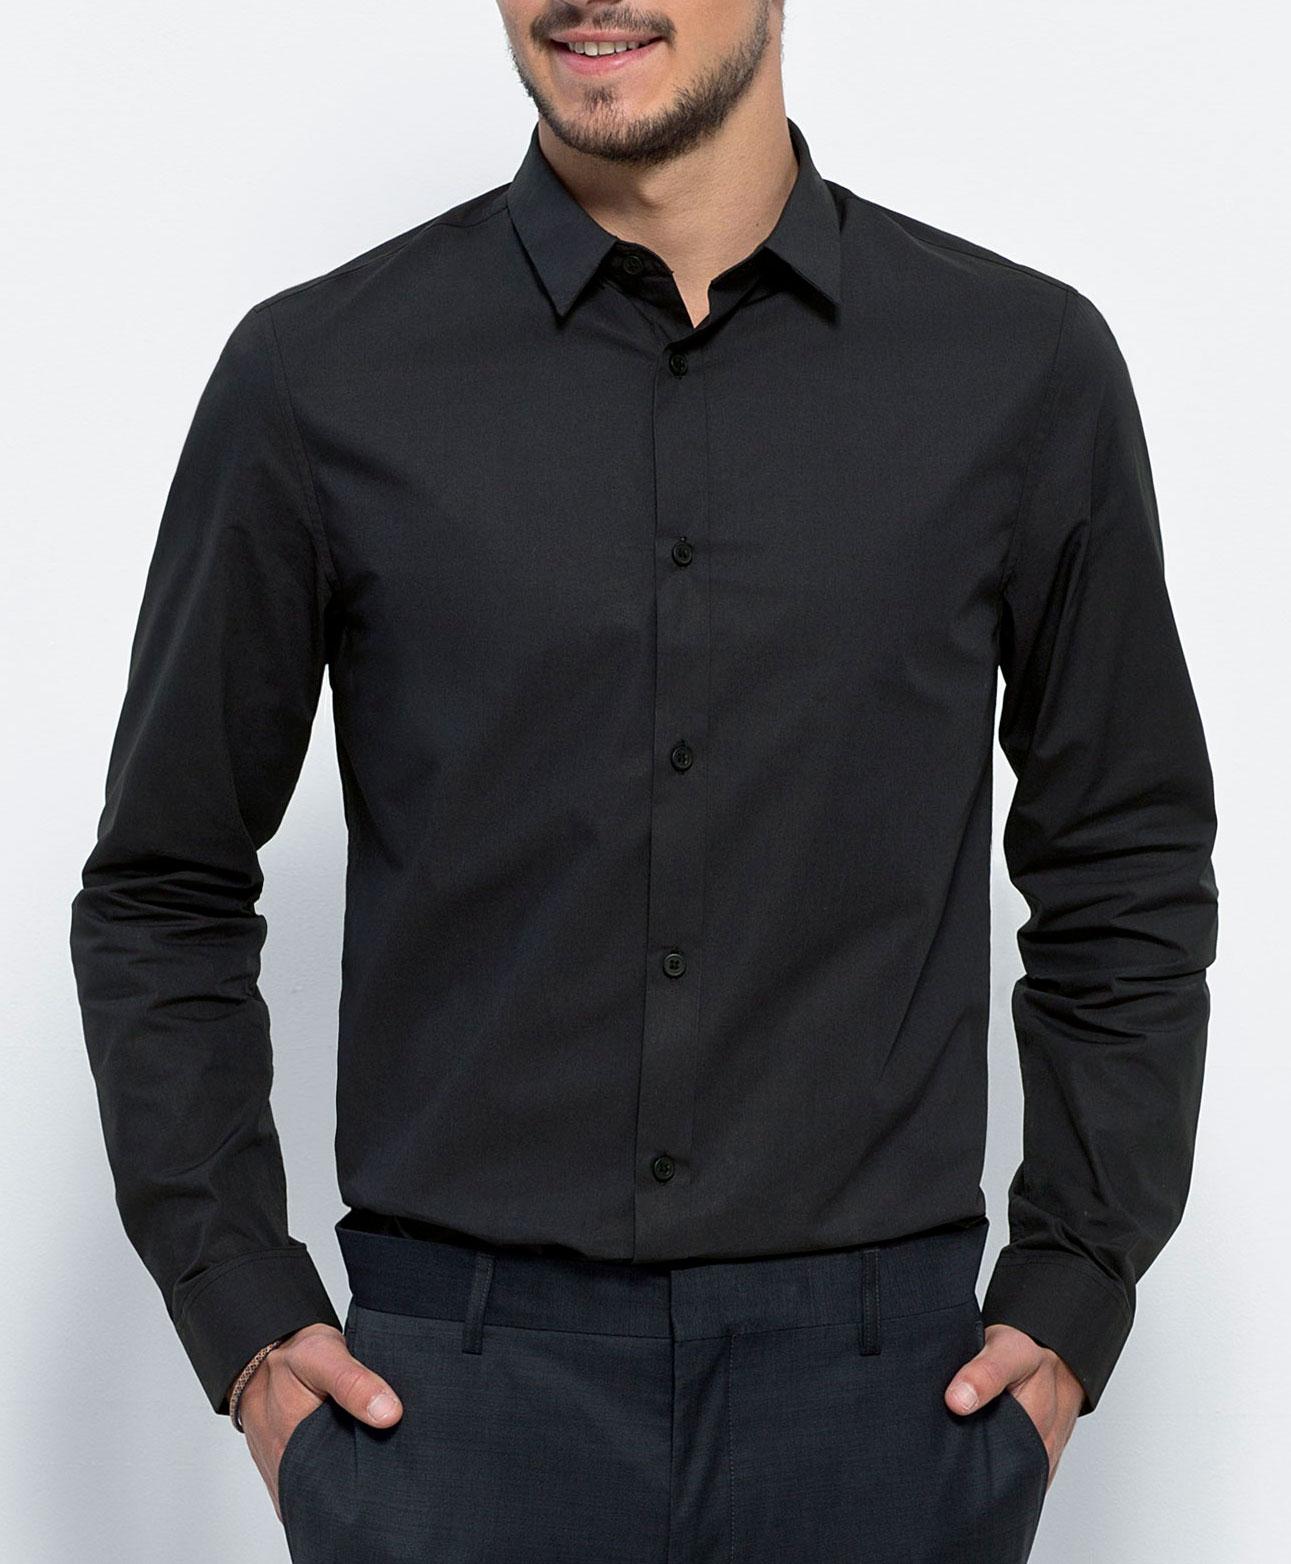 fair trade business hemd schwarz 100 bio baumwolle. Black Bedroom Furniture Sets. Home Design Ideas